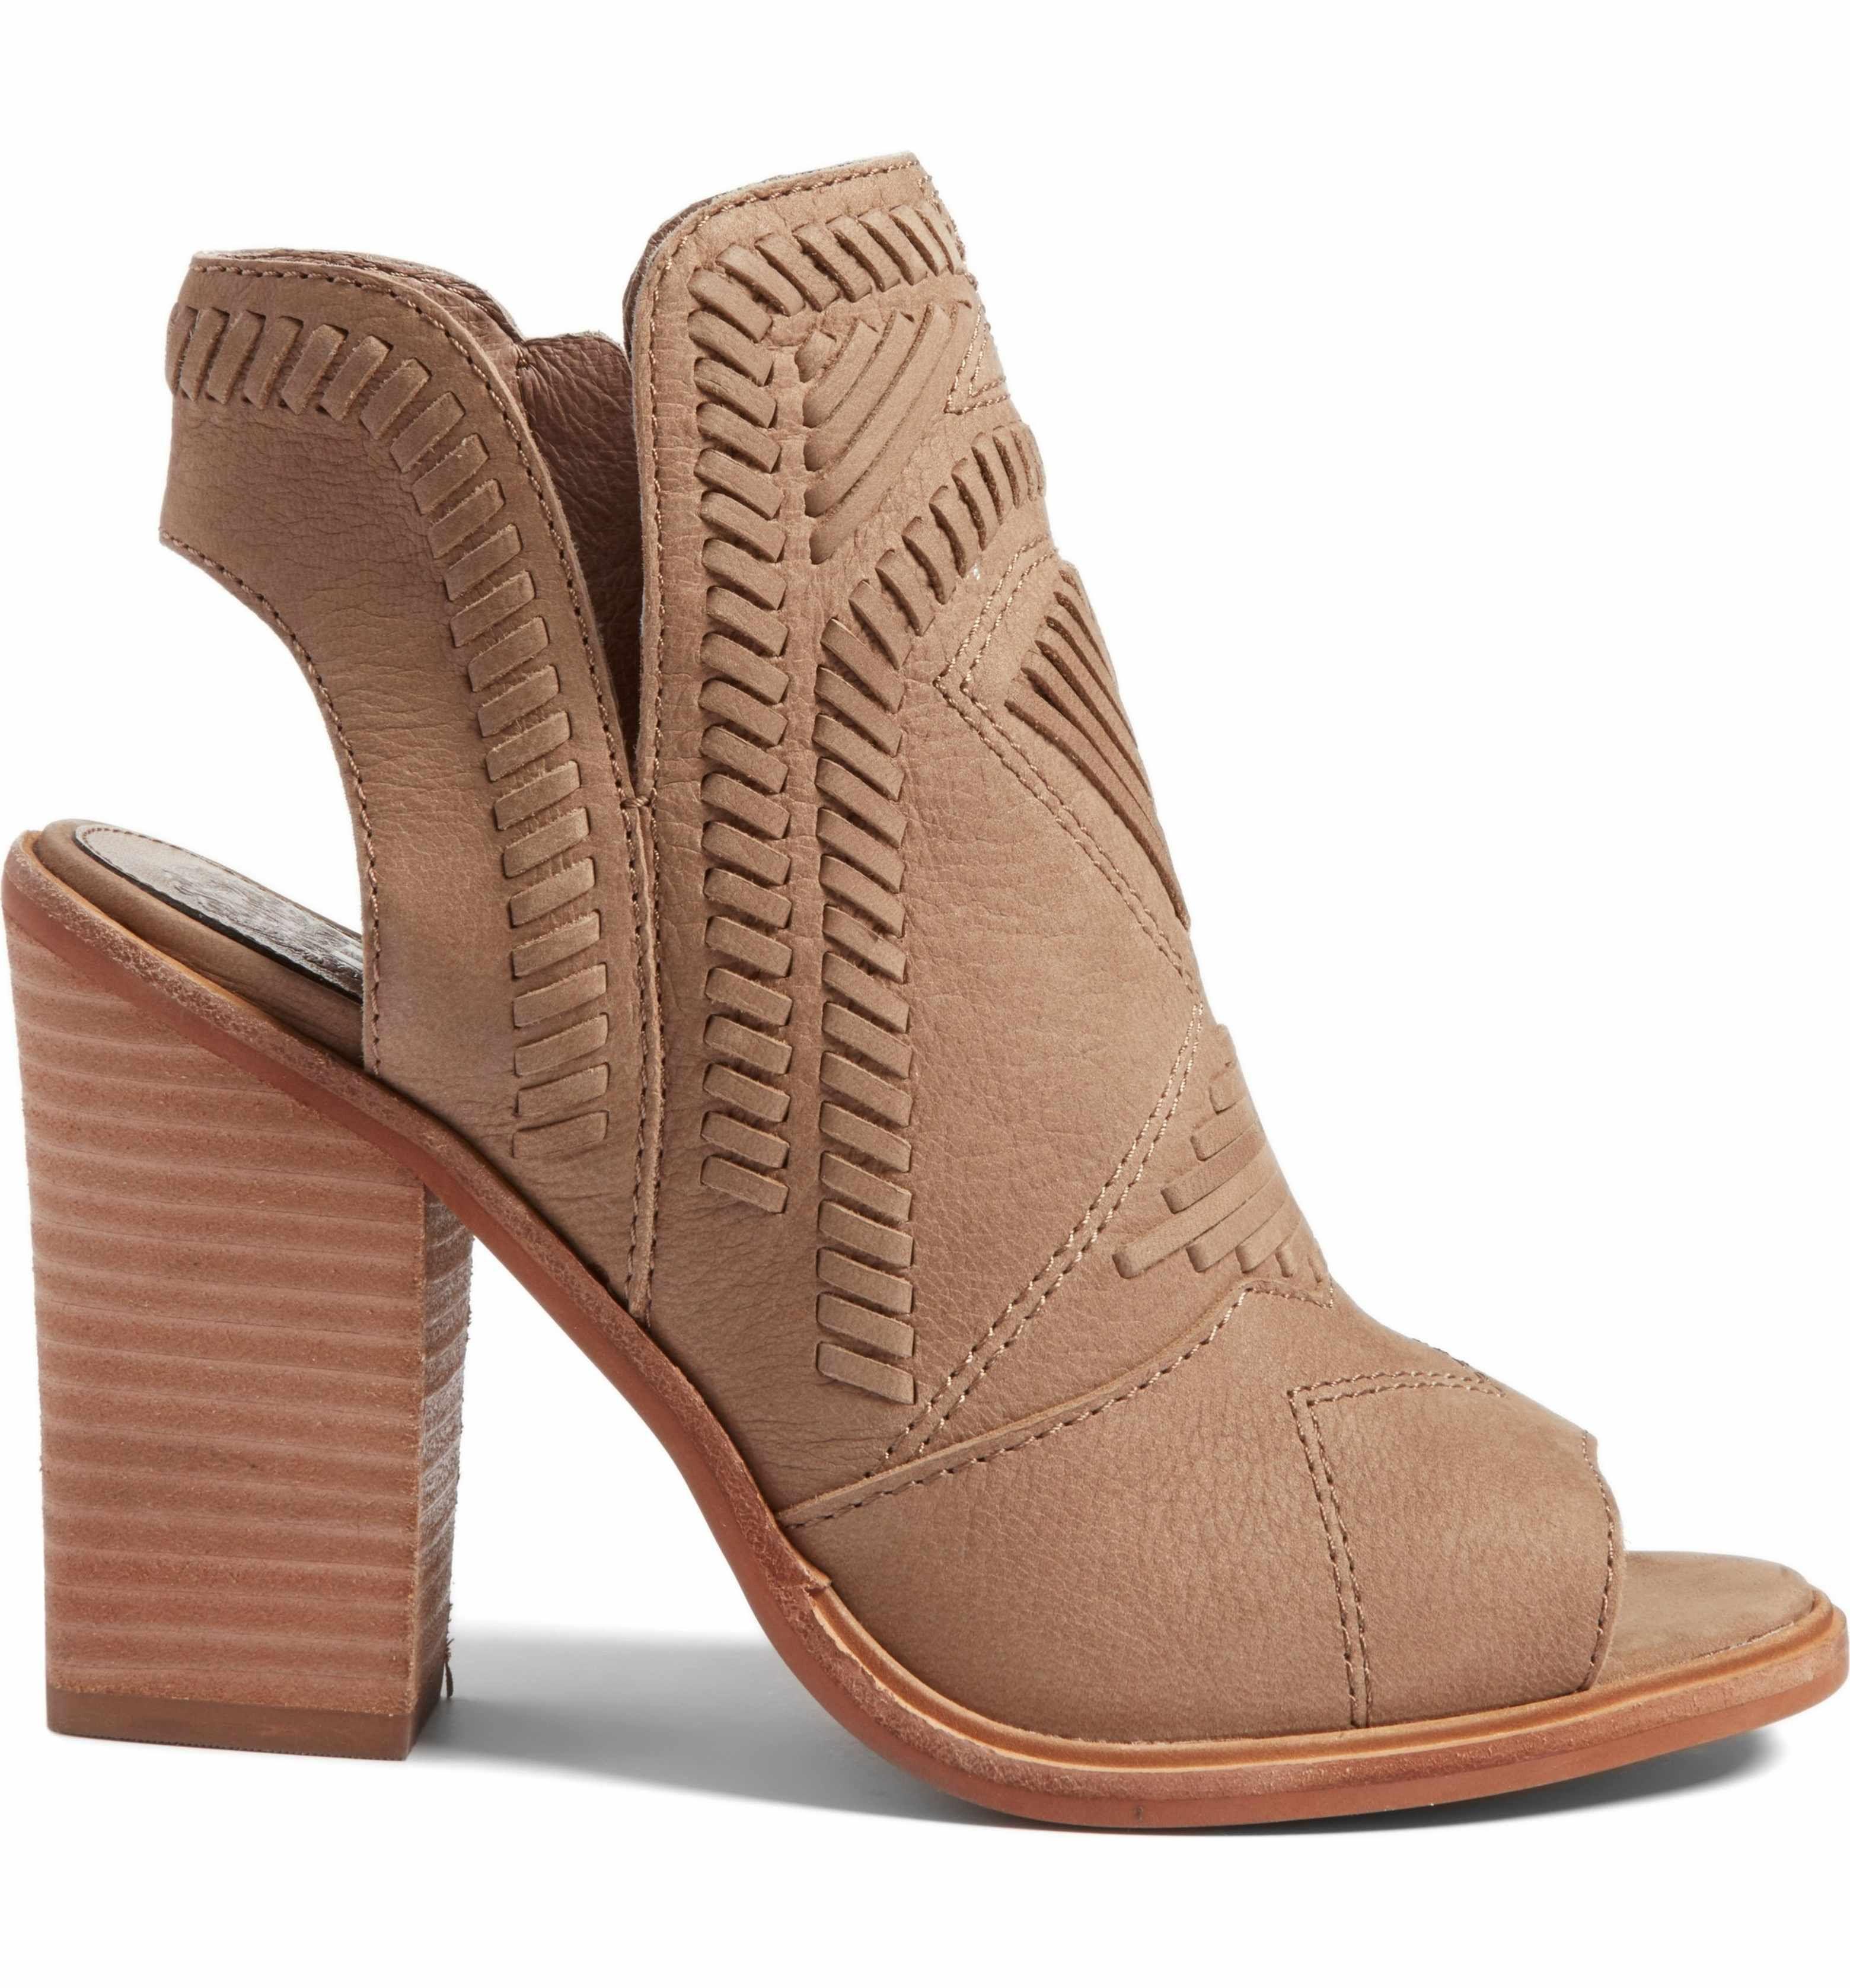 feeb141b24 Main Image - Vince Camuto Karinta Block Heel Bootie (Women ...